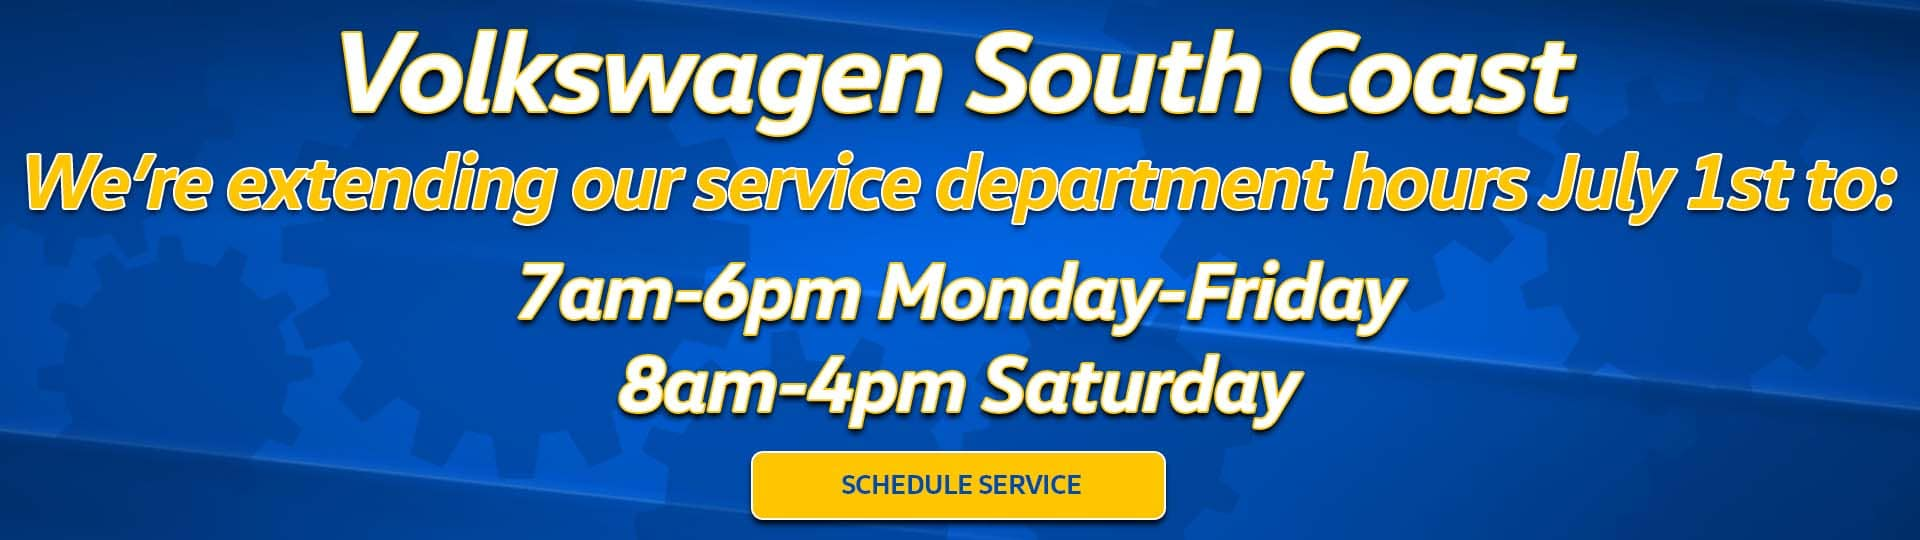 Volkswagen South Coast Service Department Hours Slide